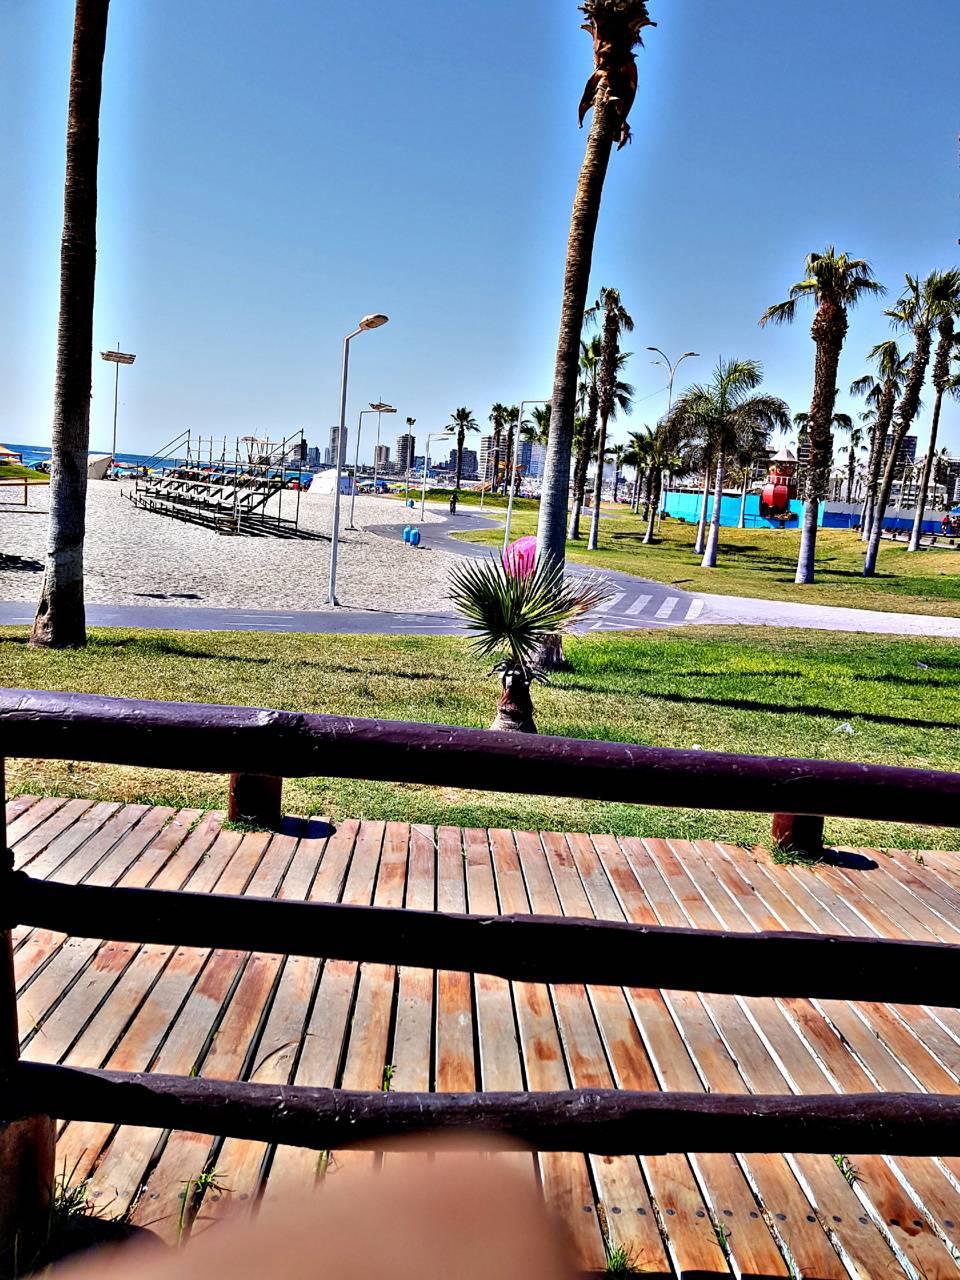 Playa Chile iquique